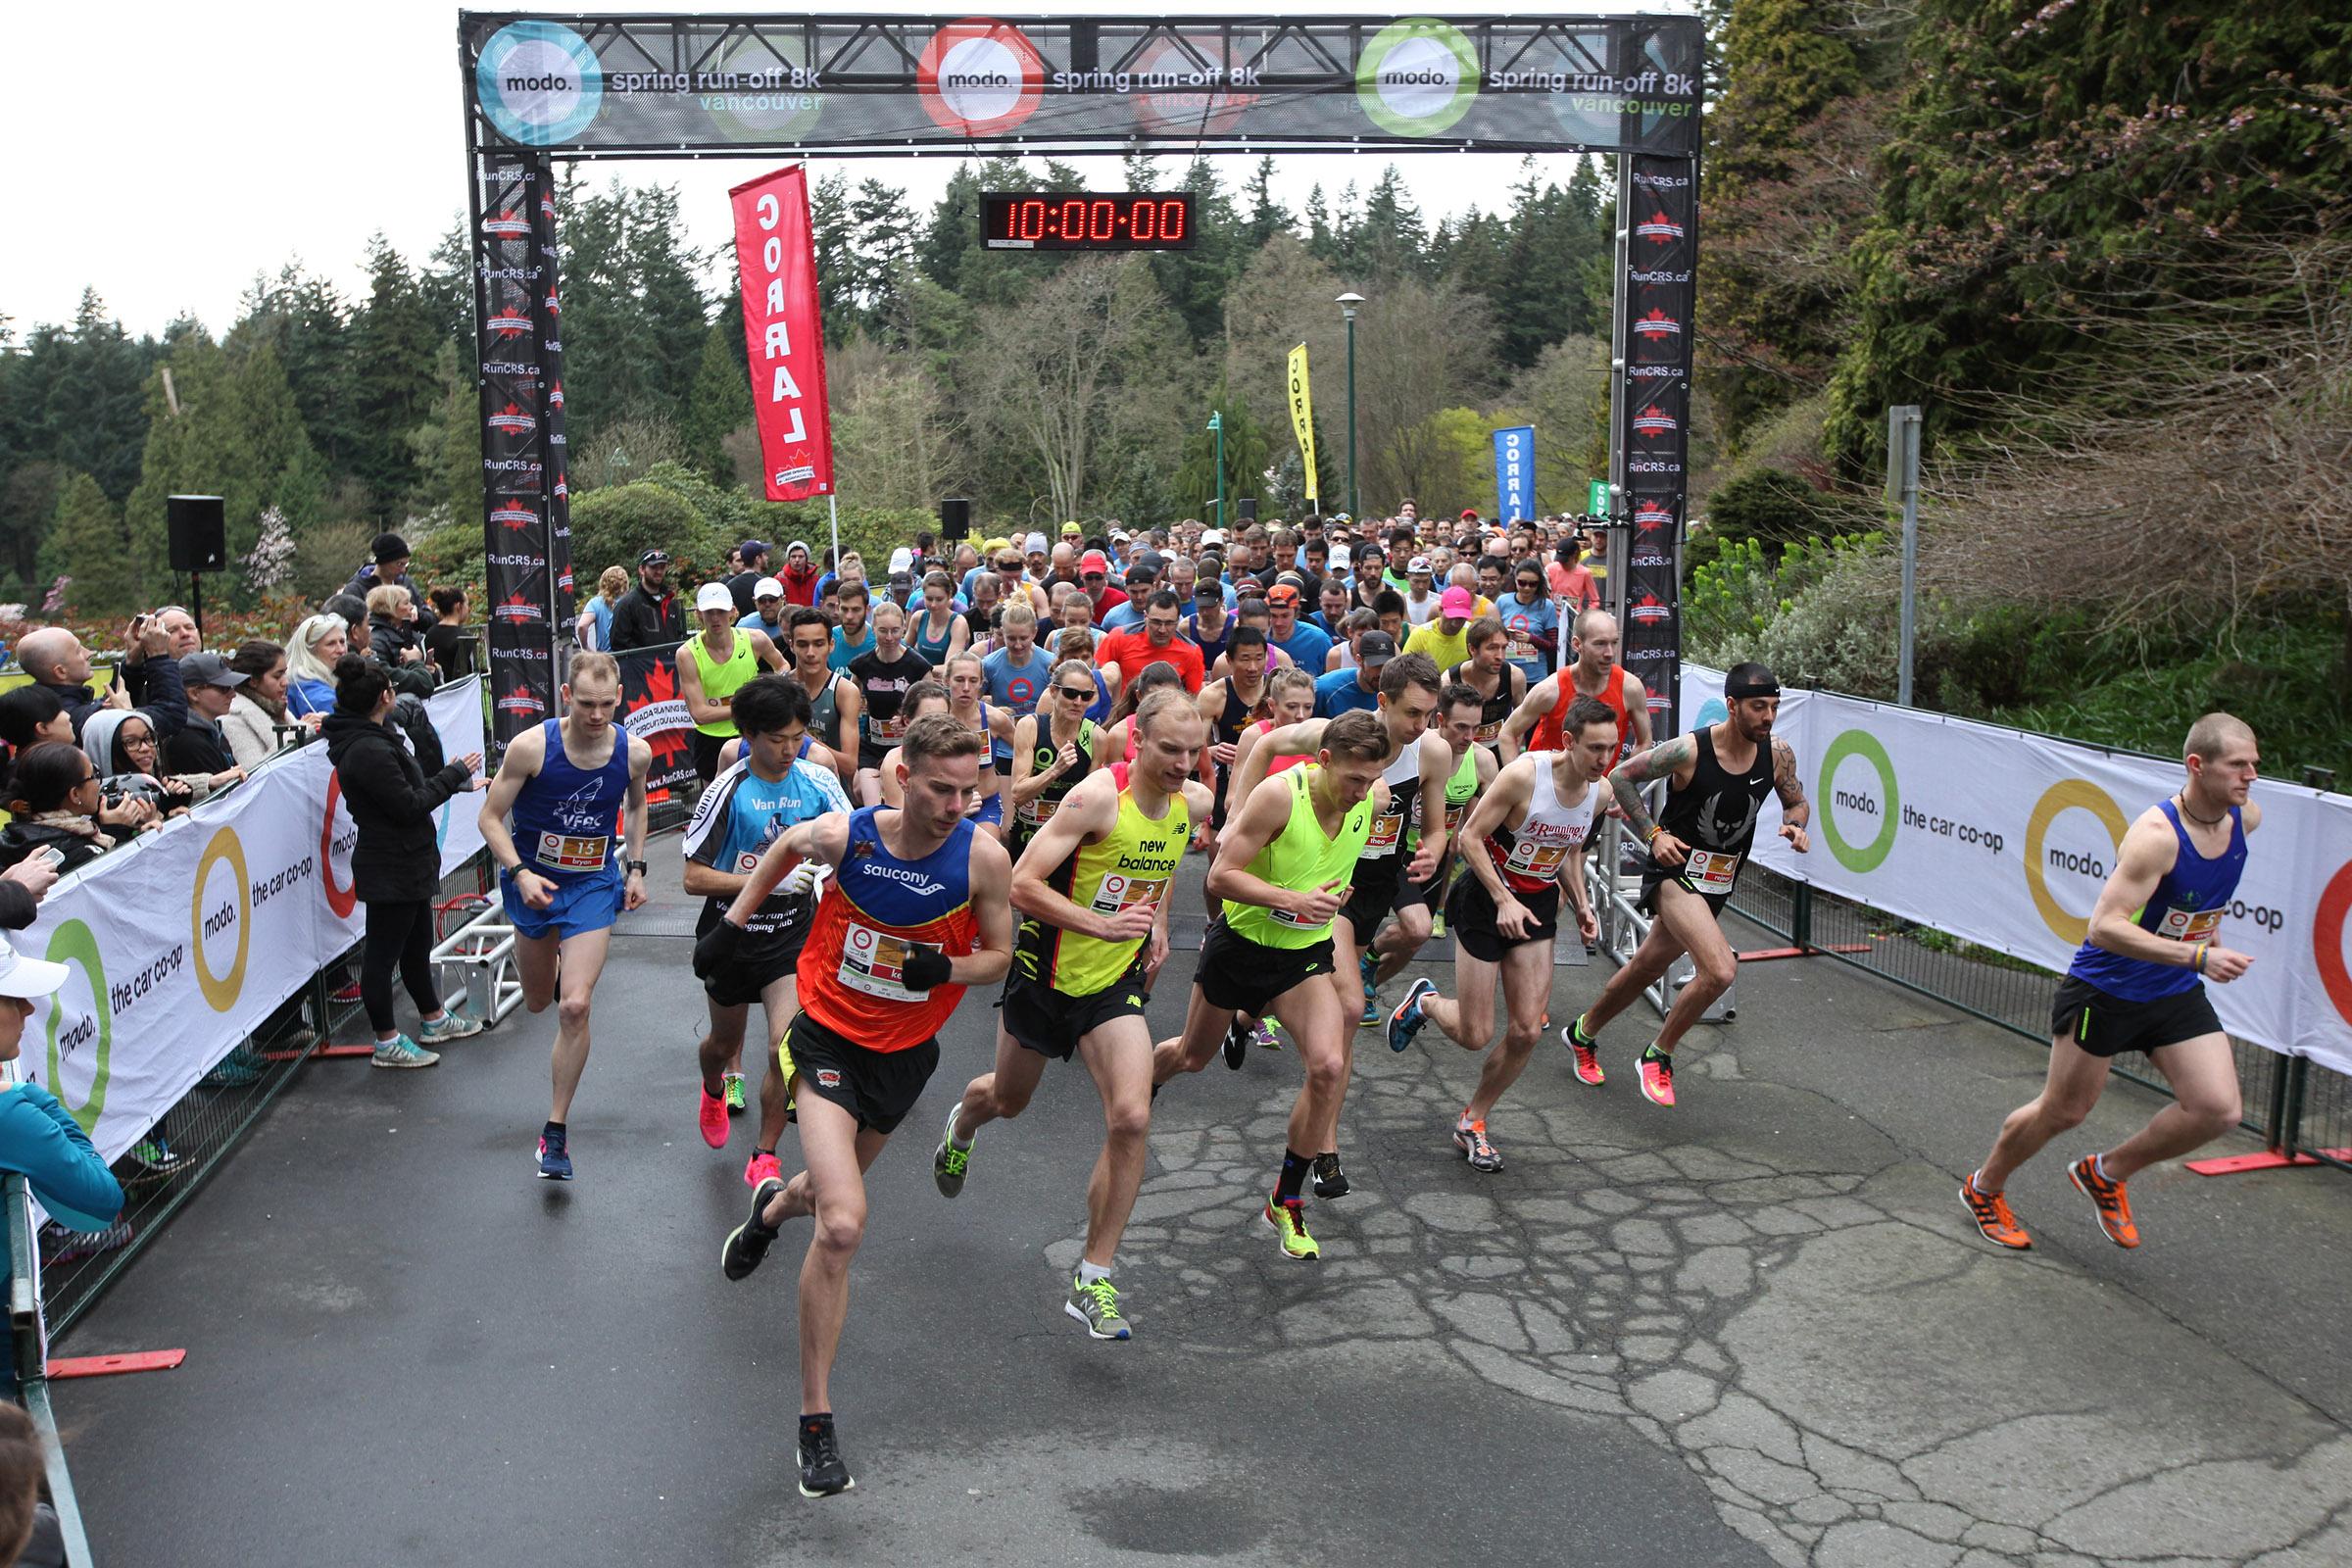 Spring Run-Off